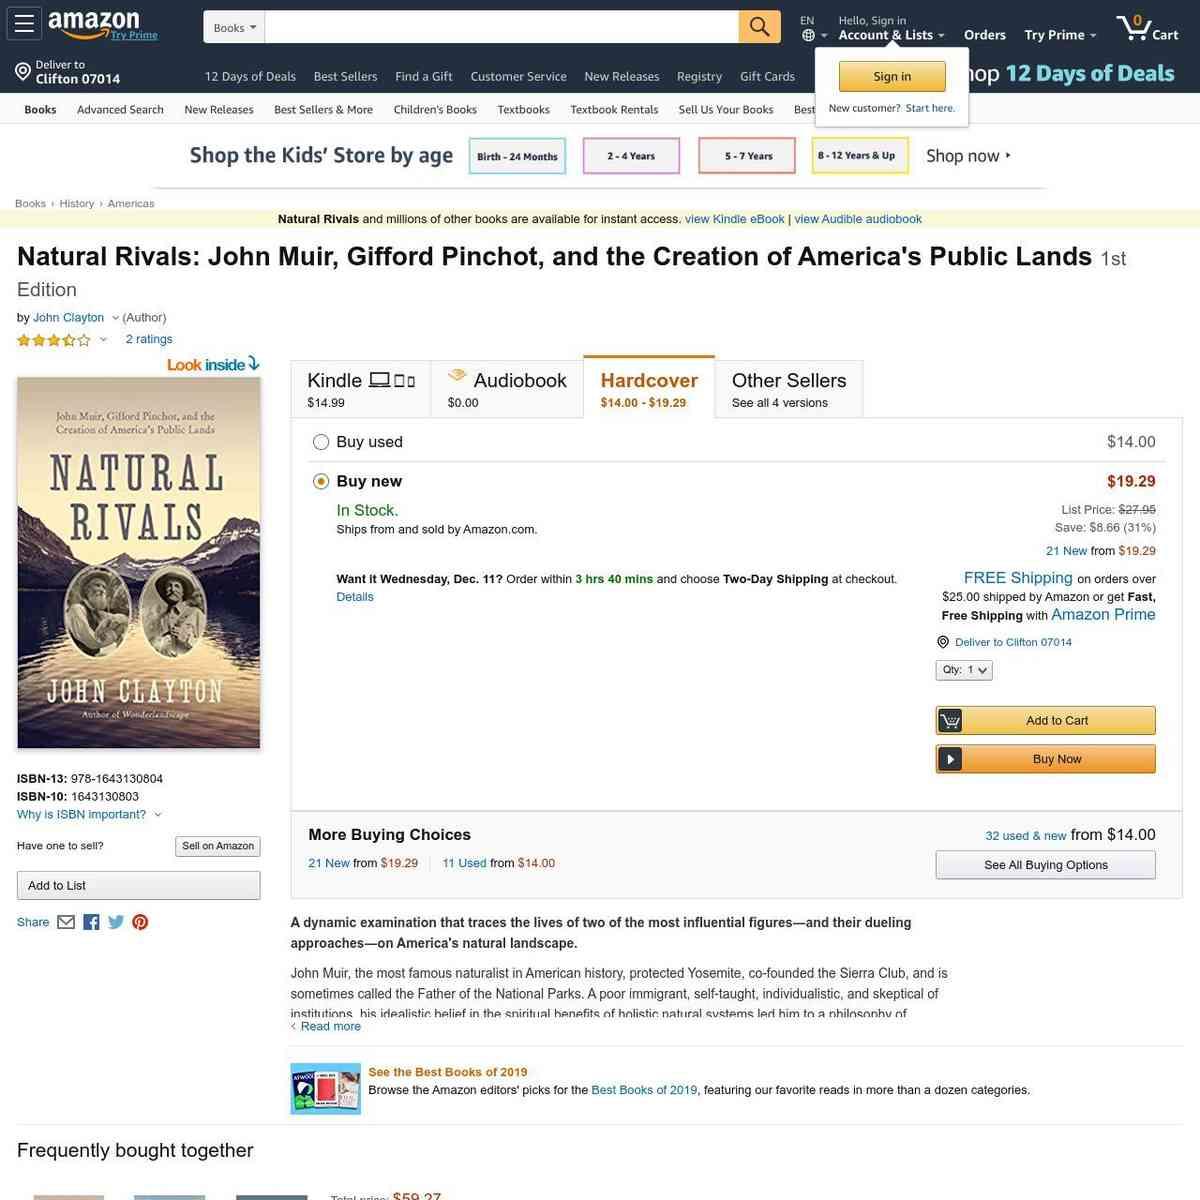 amazon.com/Natural-Rivals-Gifford-Creation-Americas/dp/1643130803/ref=nodl_